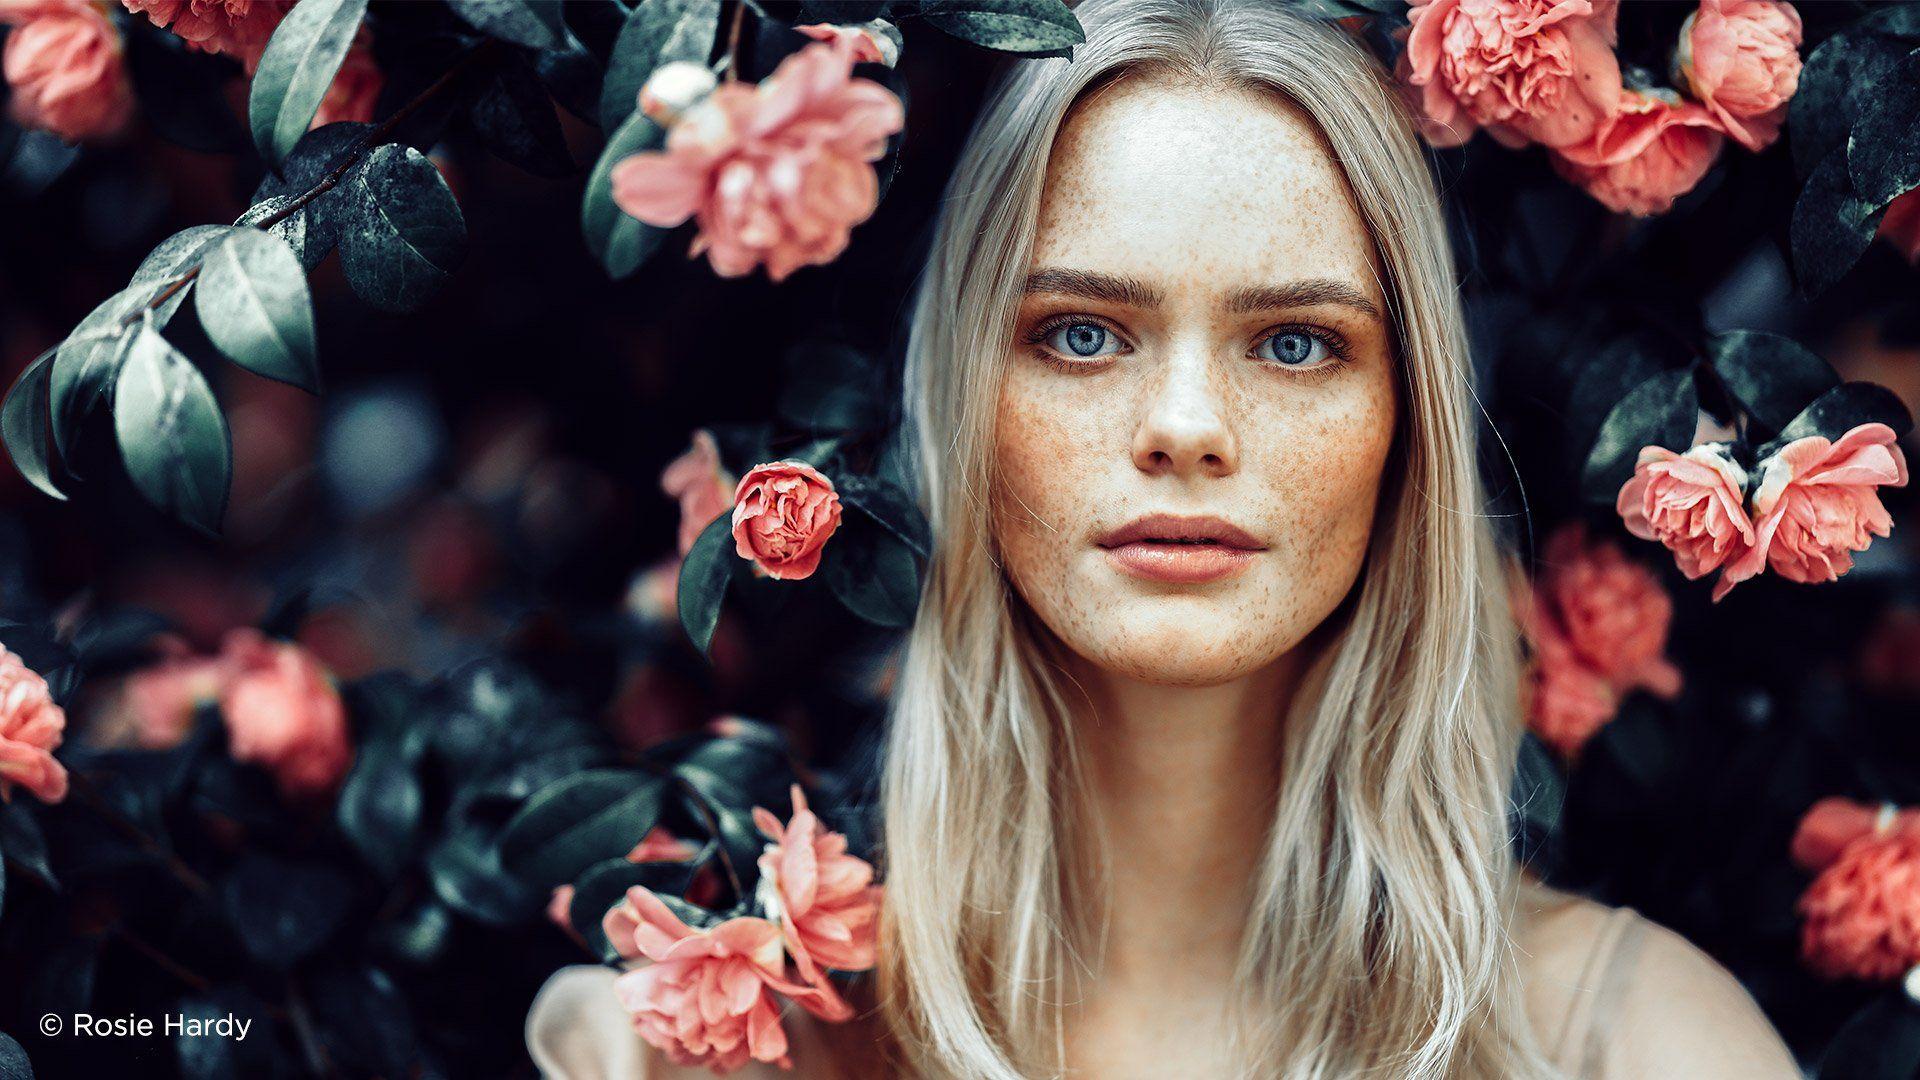 female_model_flowers_rf-85mm-f1-2l-usm_rosie_hardy_171541492177280.jpg